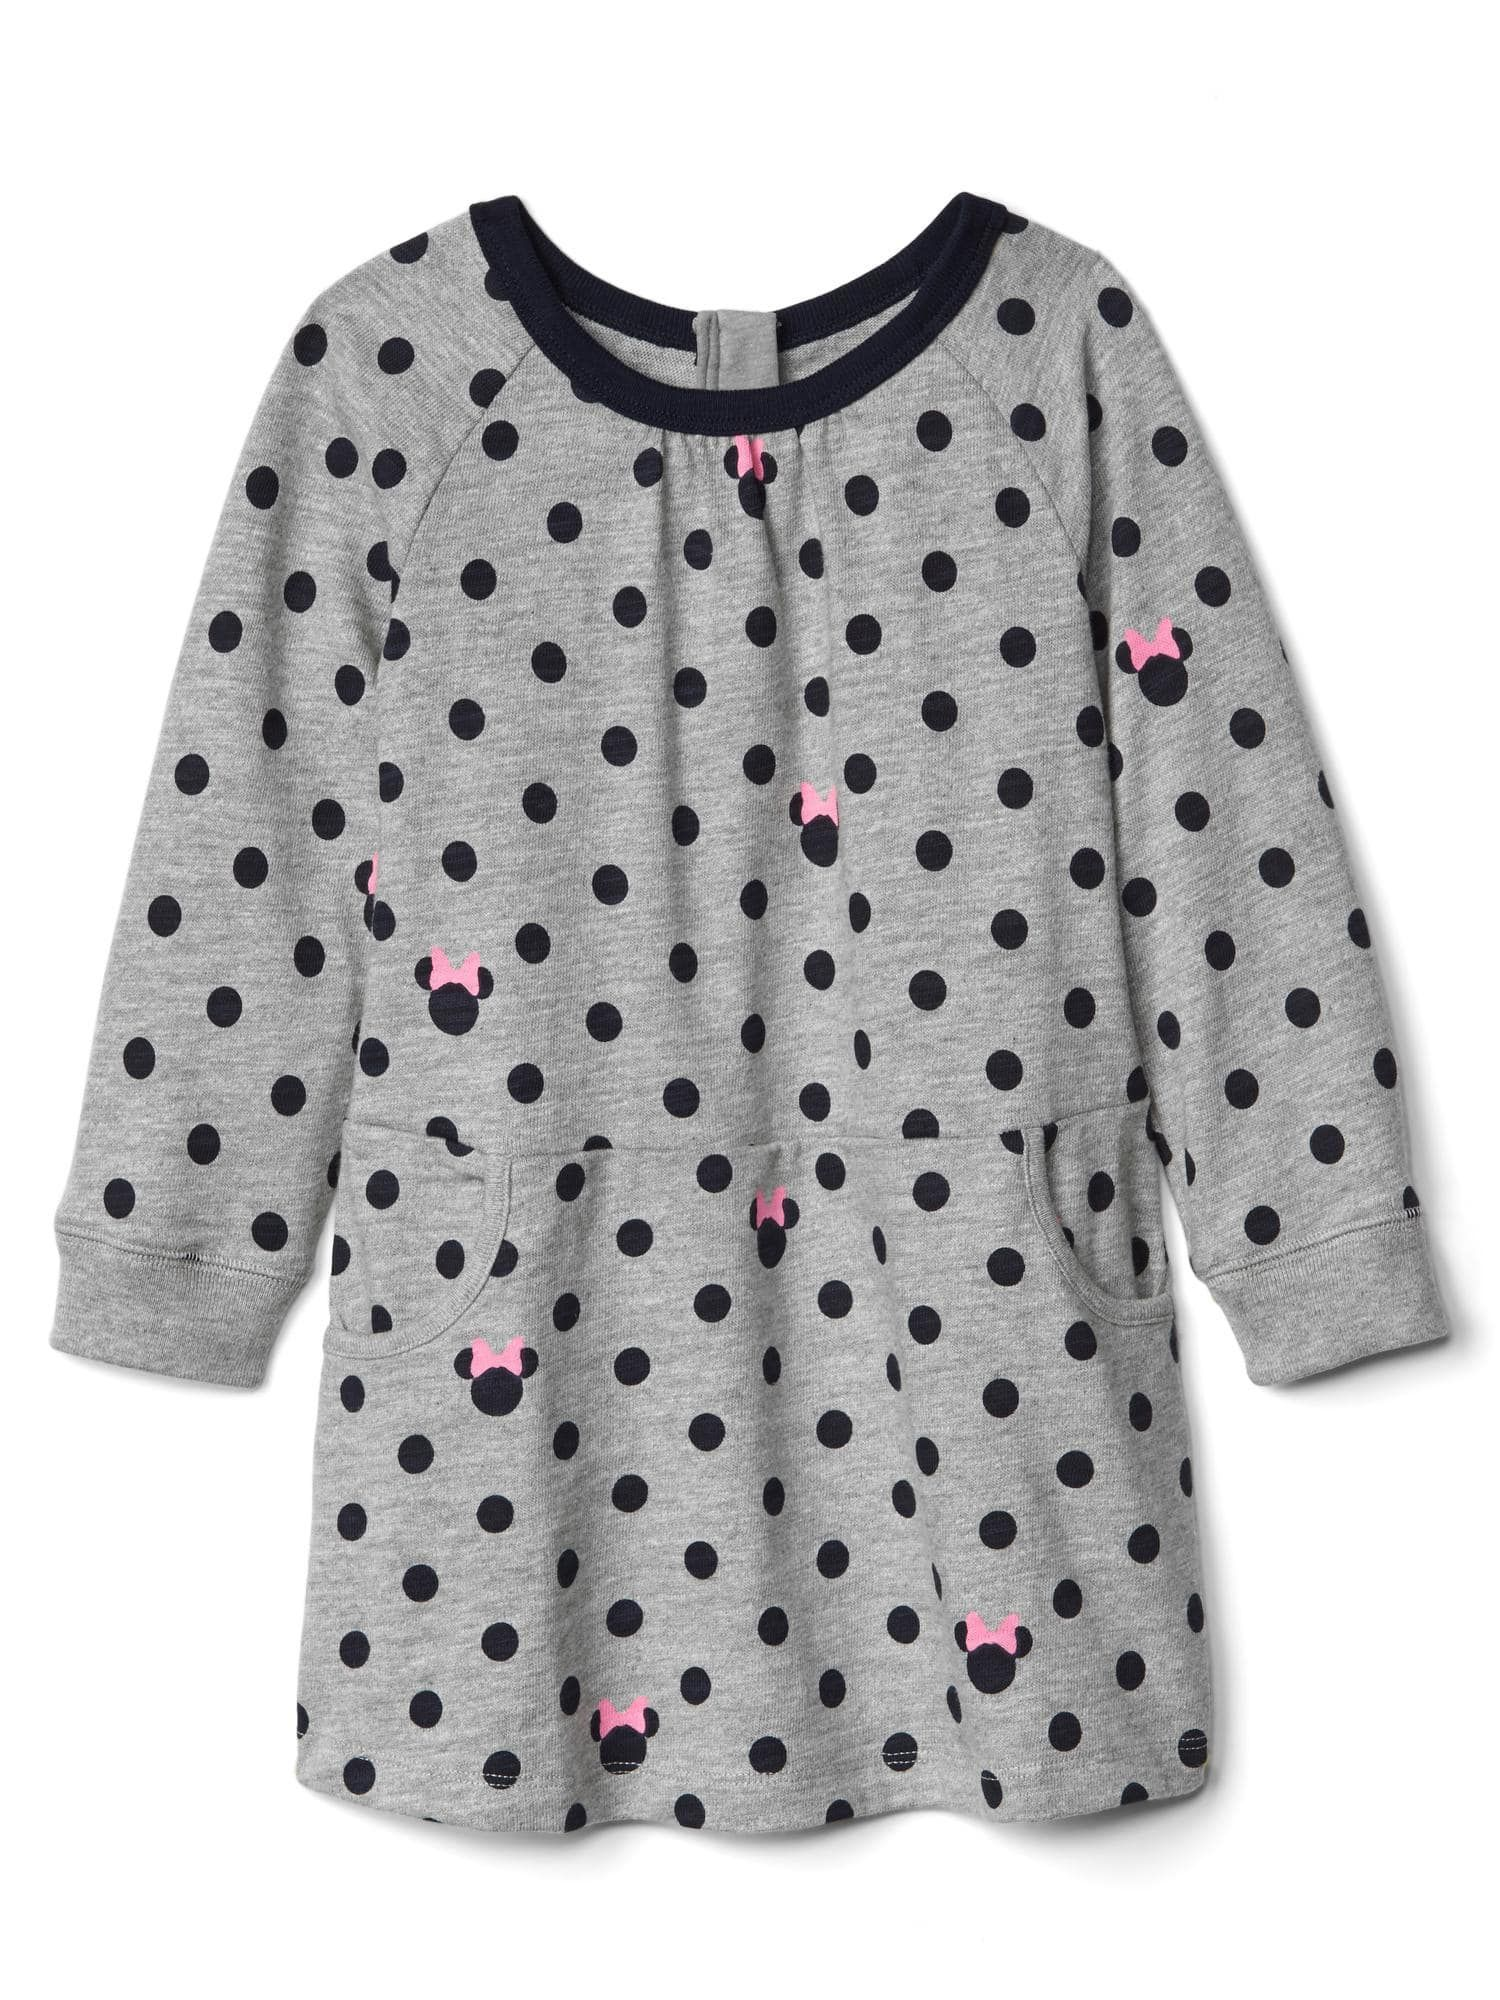 f7234403c babyGap | Disney Baby Minnie Mouse stripe dress | Gap | haha ...